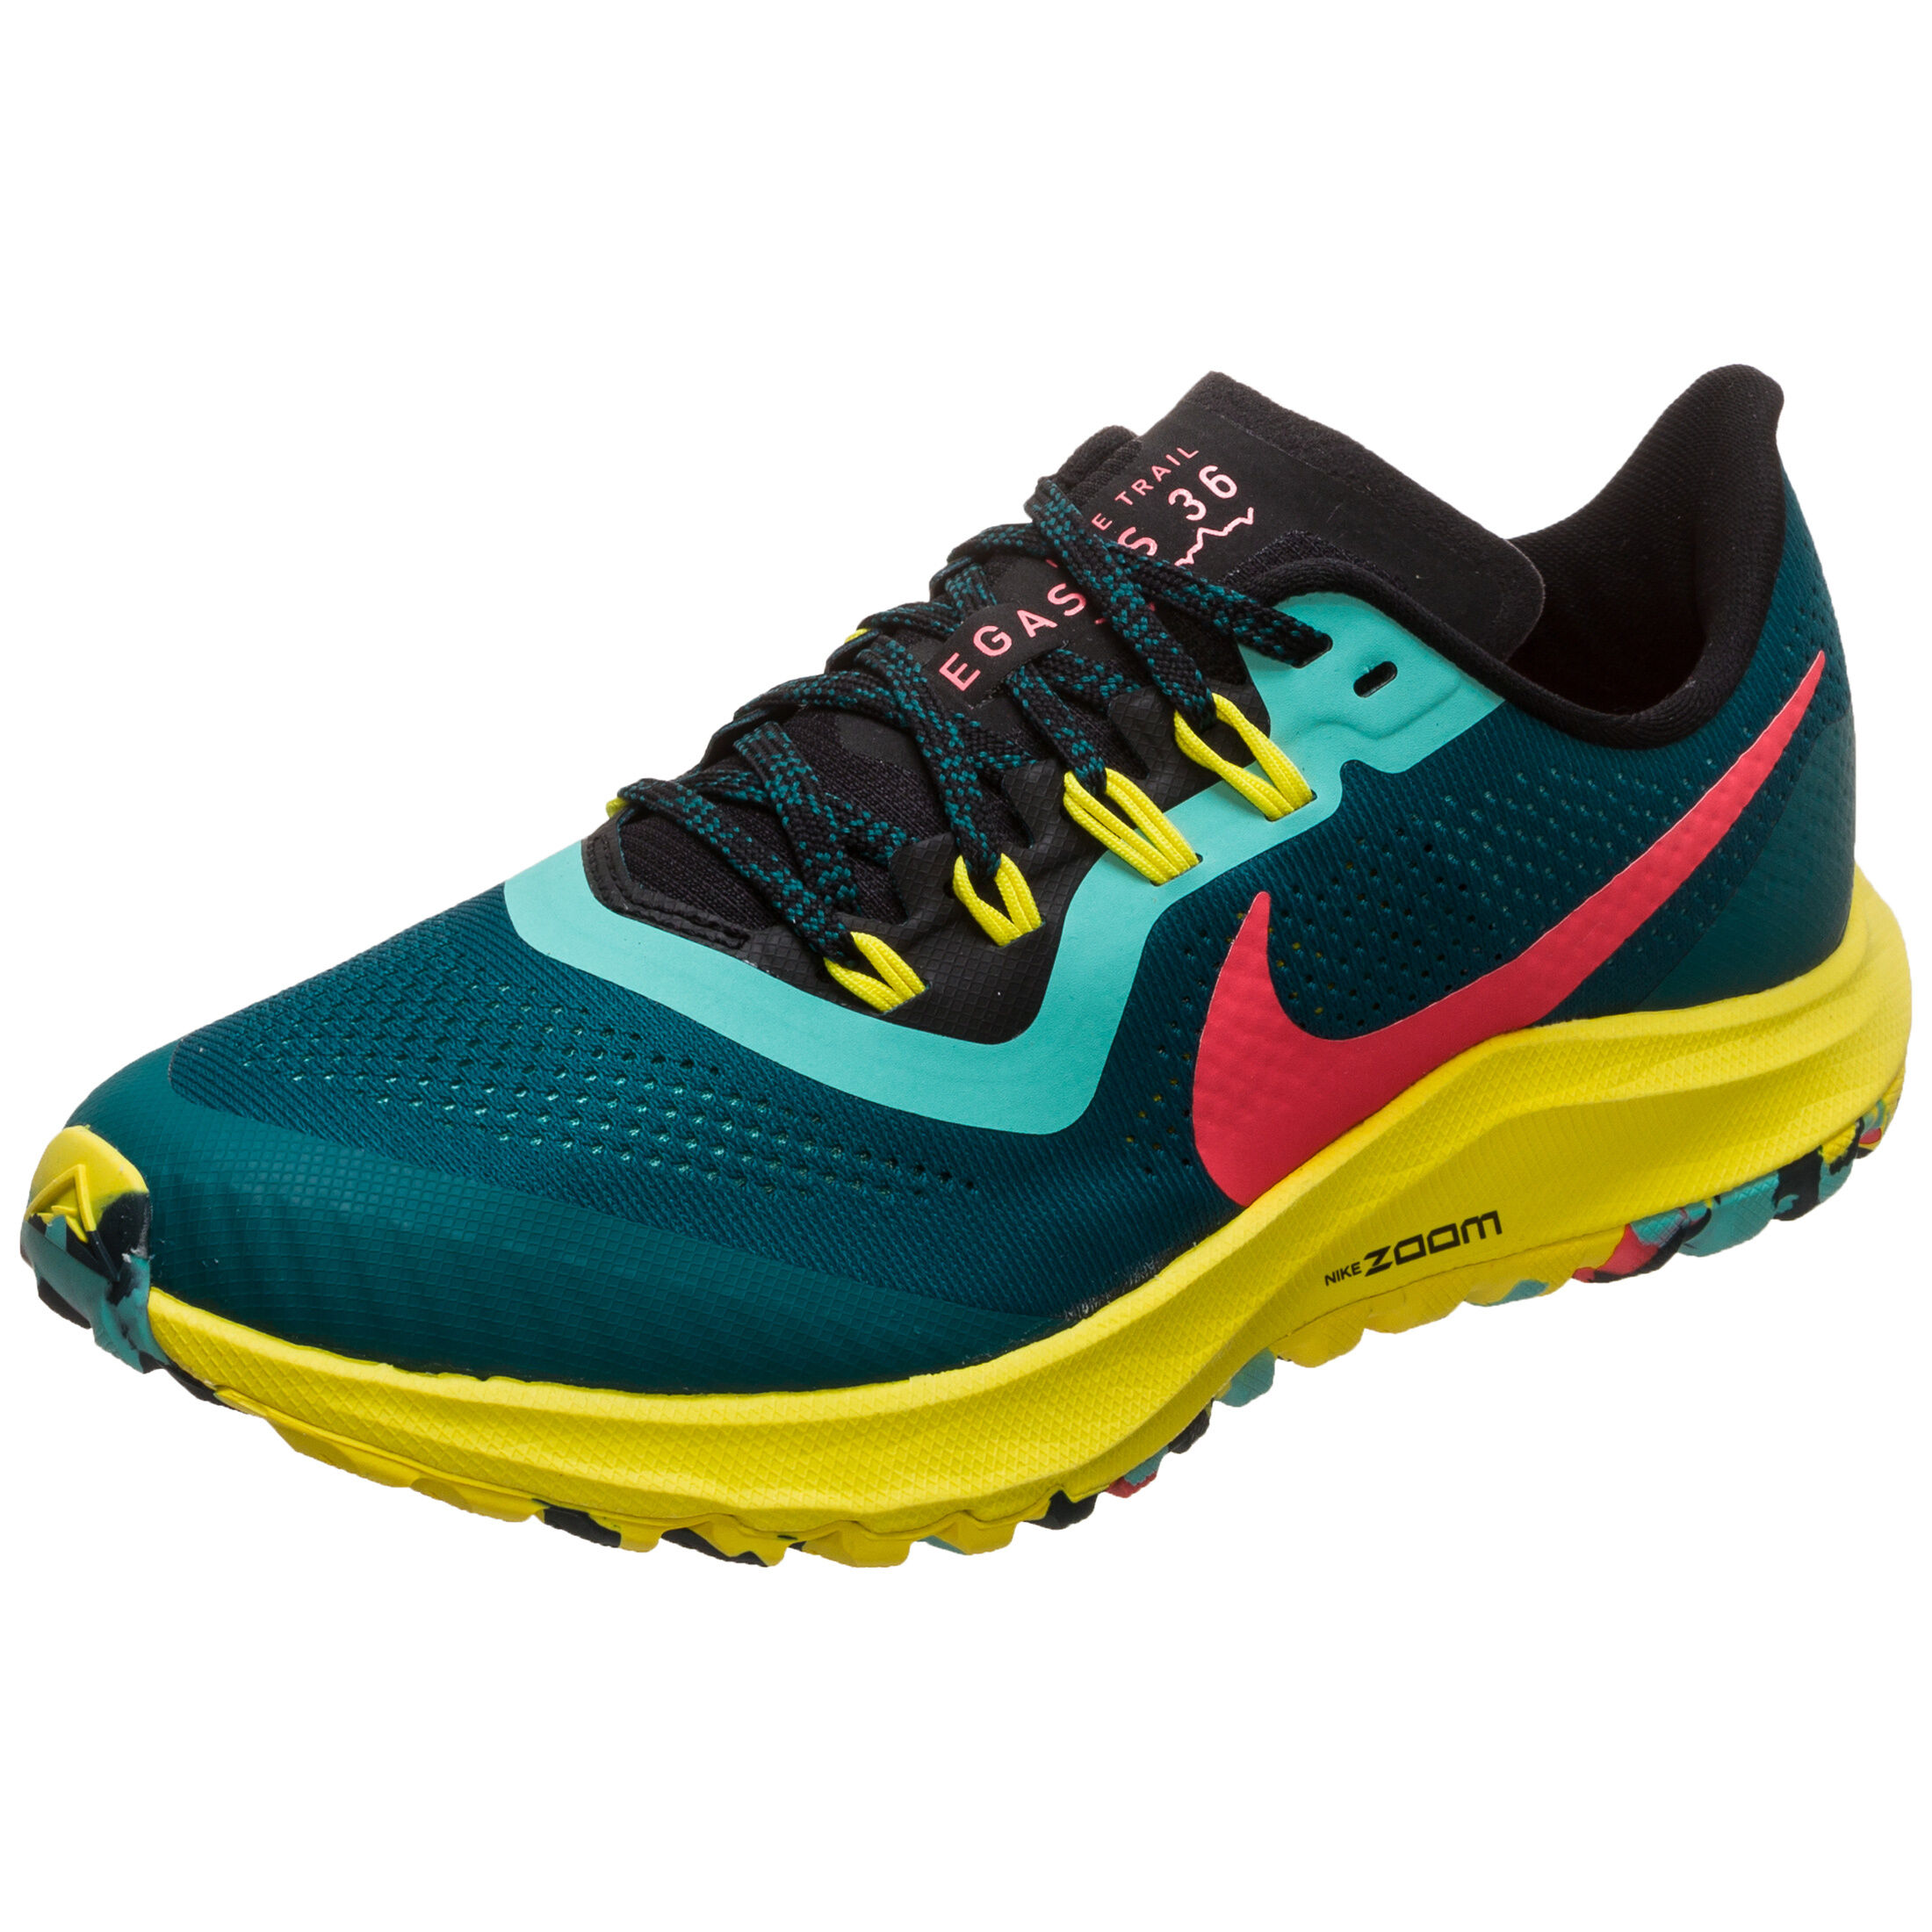 Trail Schuhe kaufen Nike Performance | Laufschuhe bei OUTFITTER